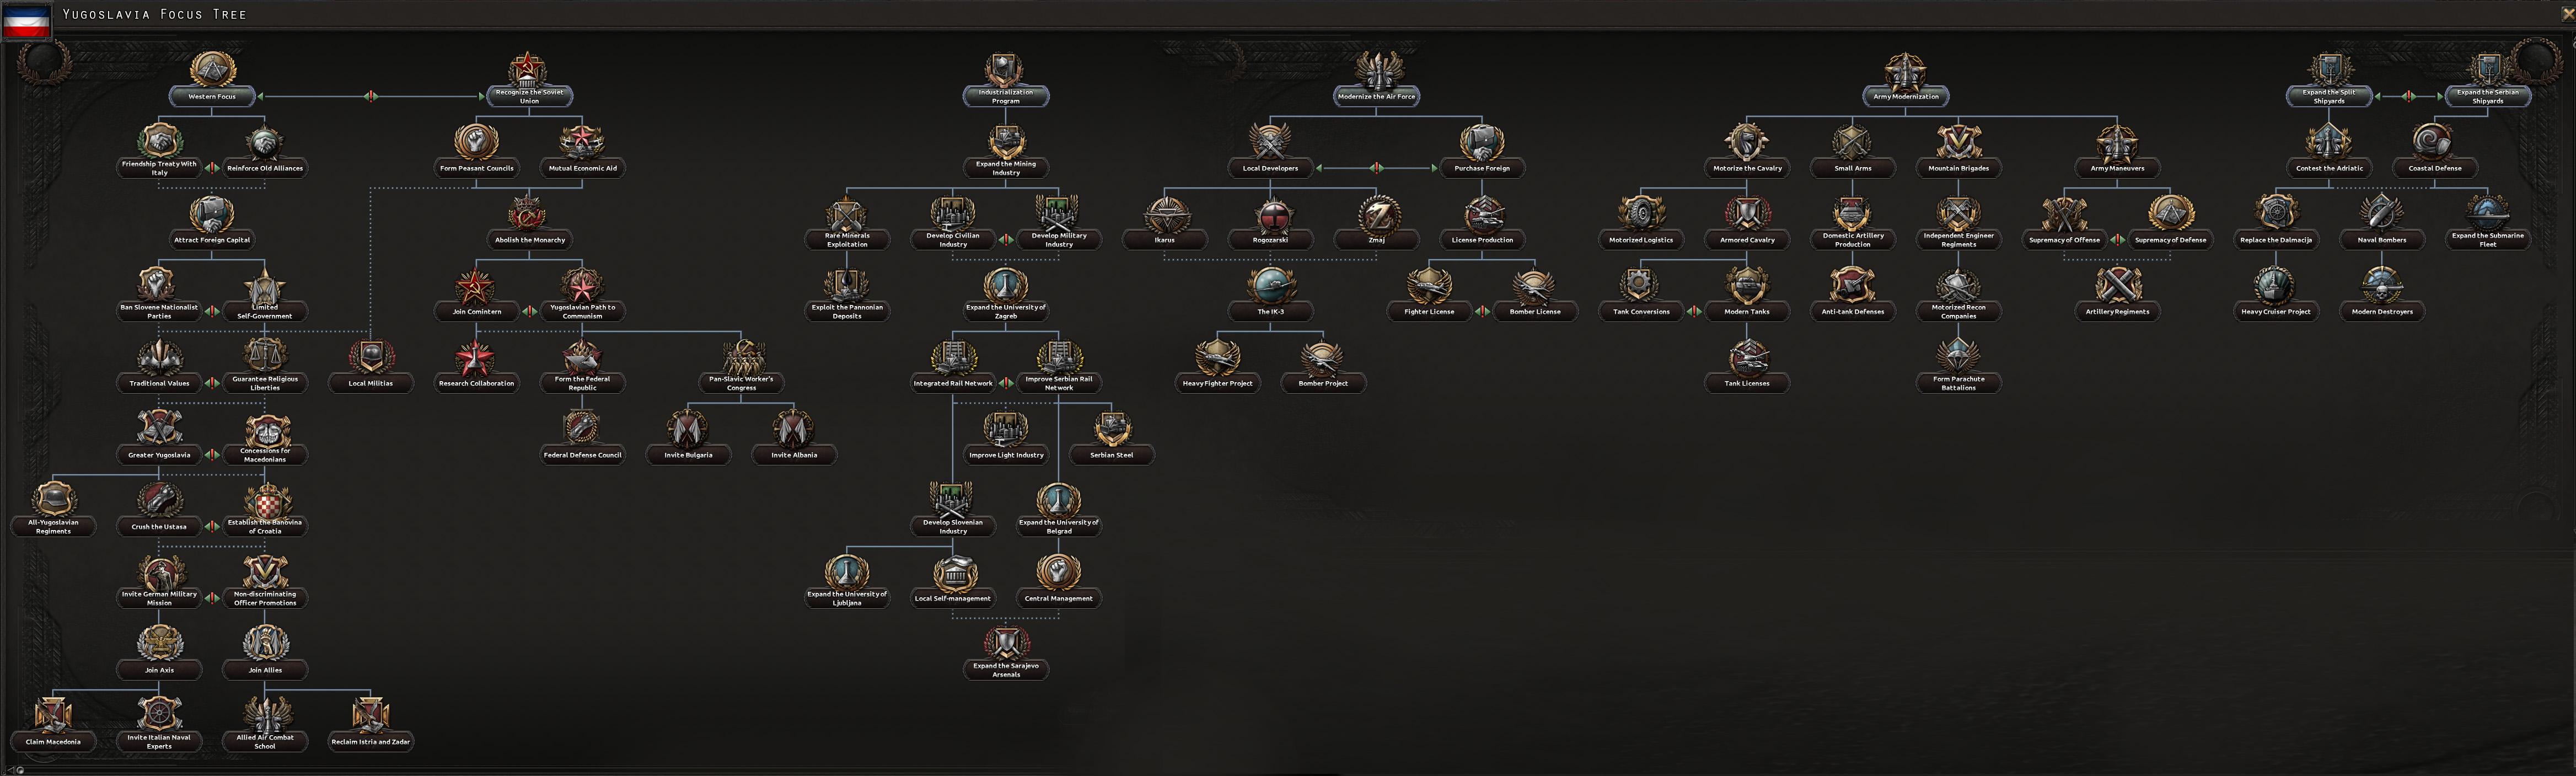 yug_tree.jpg